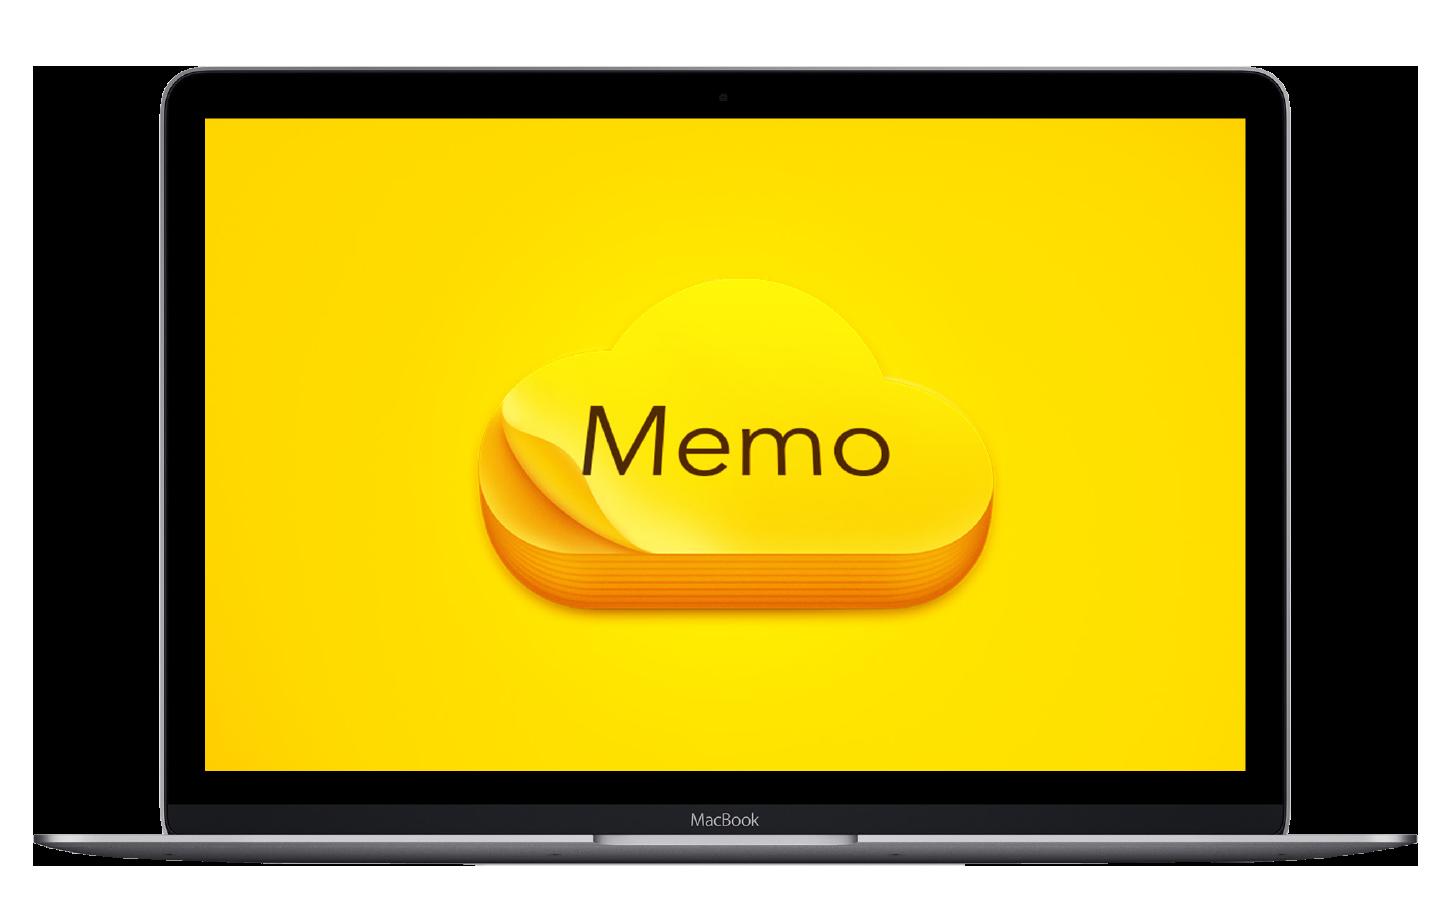 memo apps download - Parfu kaptanband co